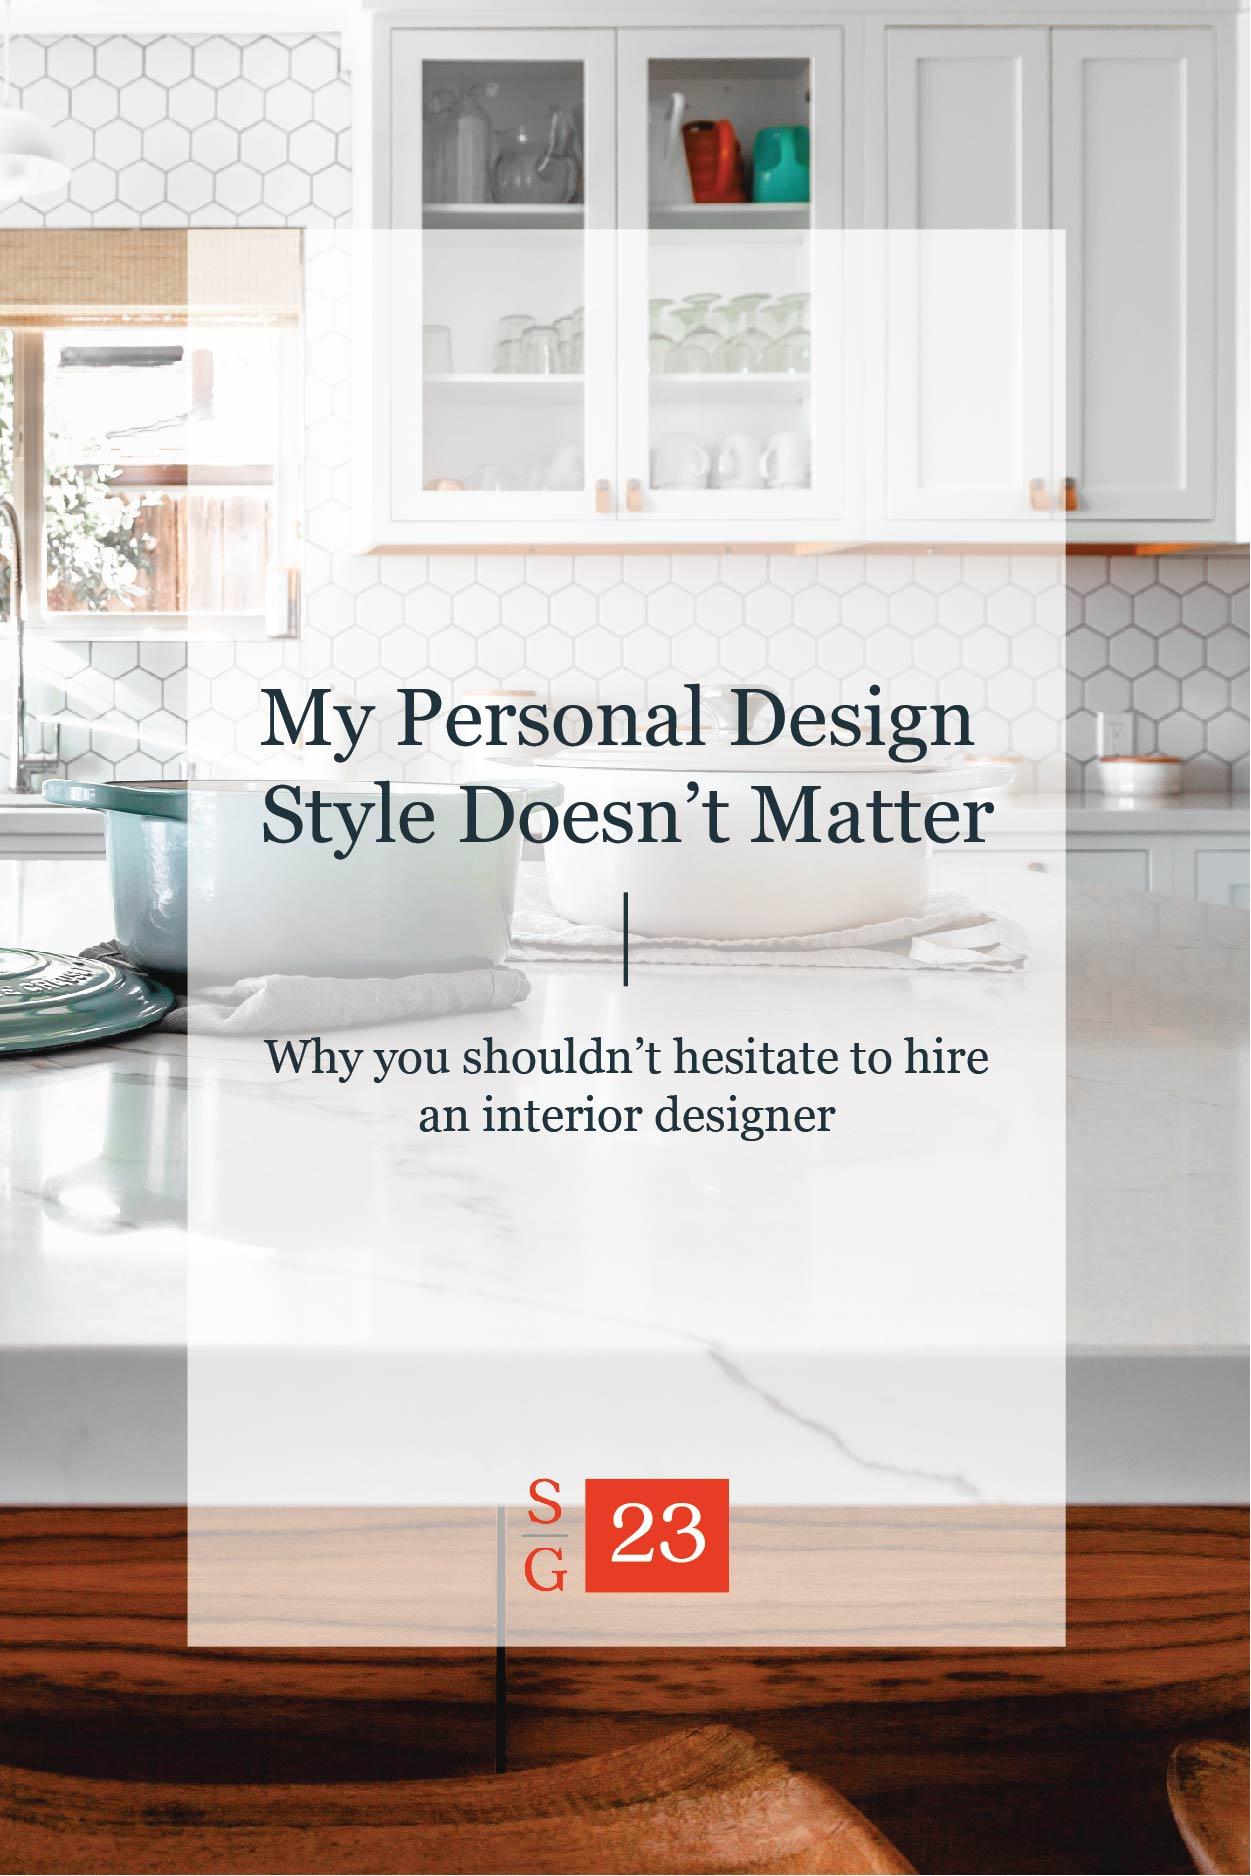 personal-design-style-01-01.jpg